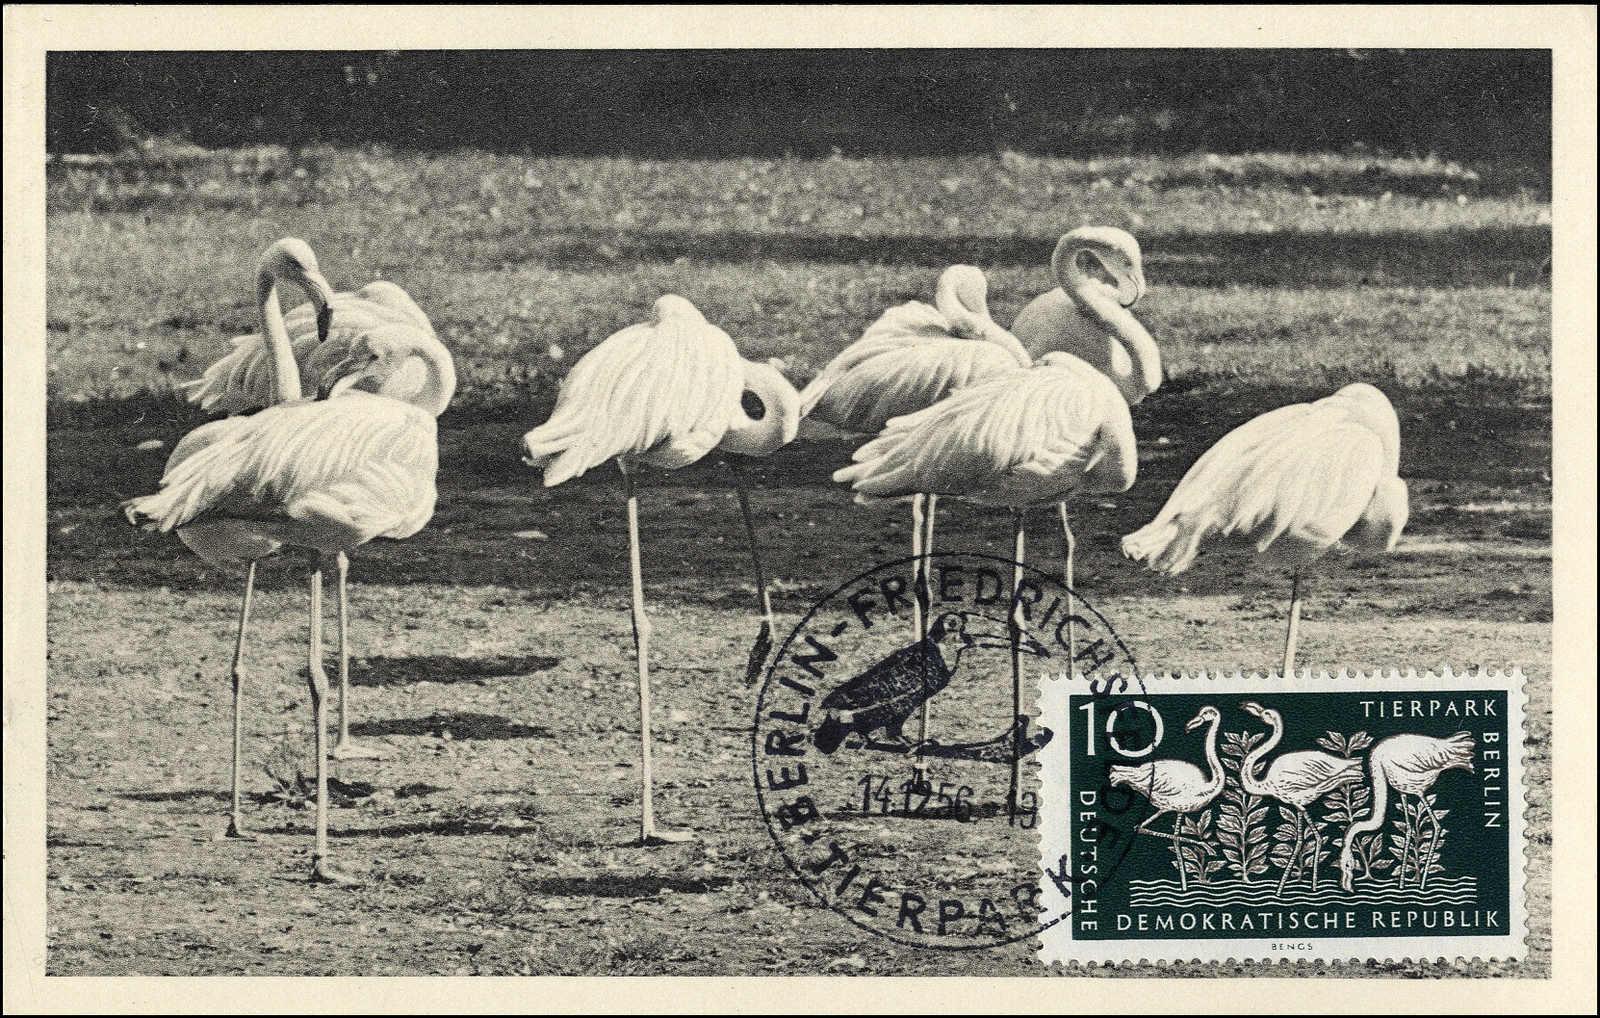 Lot 985 - deutschland ddr -  Rolli Auctions Auction #68 Day 1